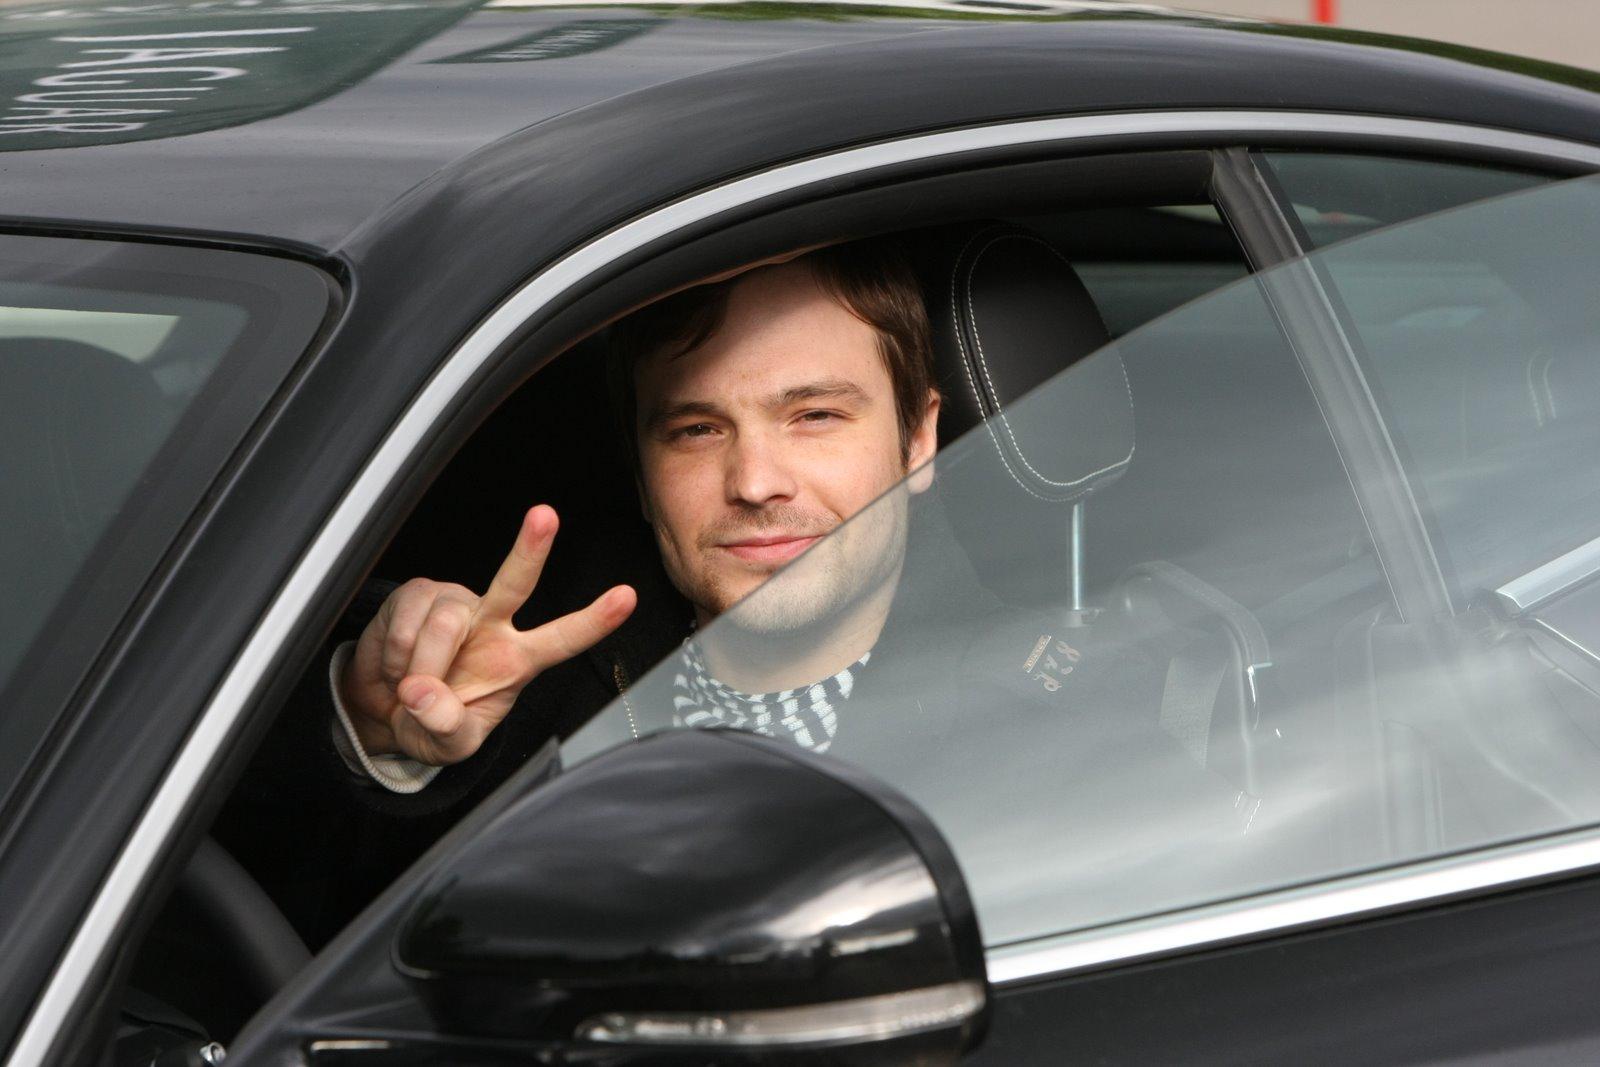 Alexey Chadov boasted with a new car 11/12/2015 73